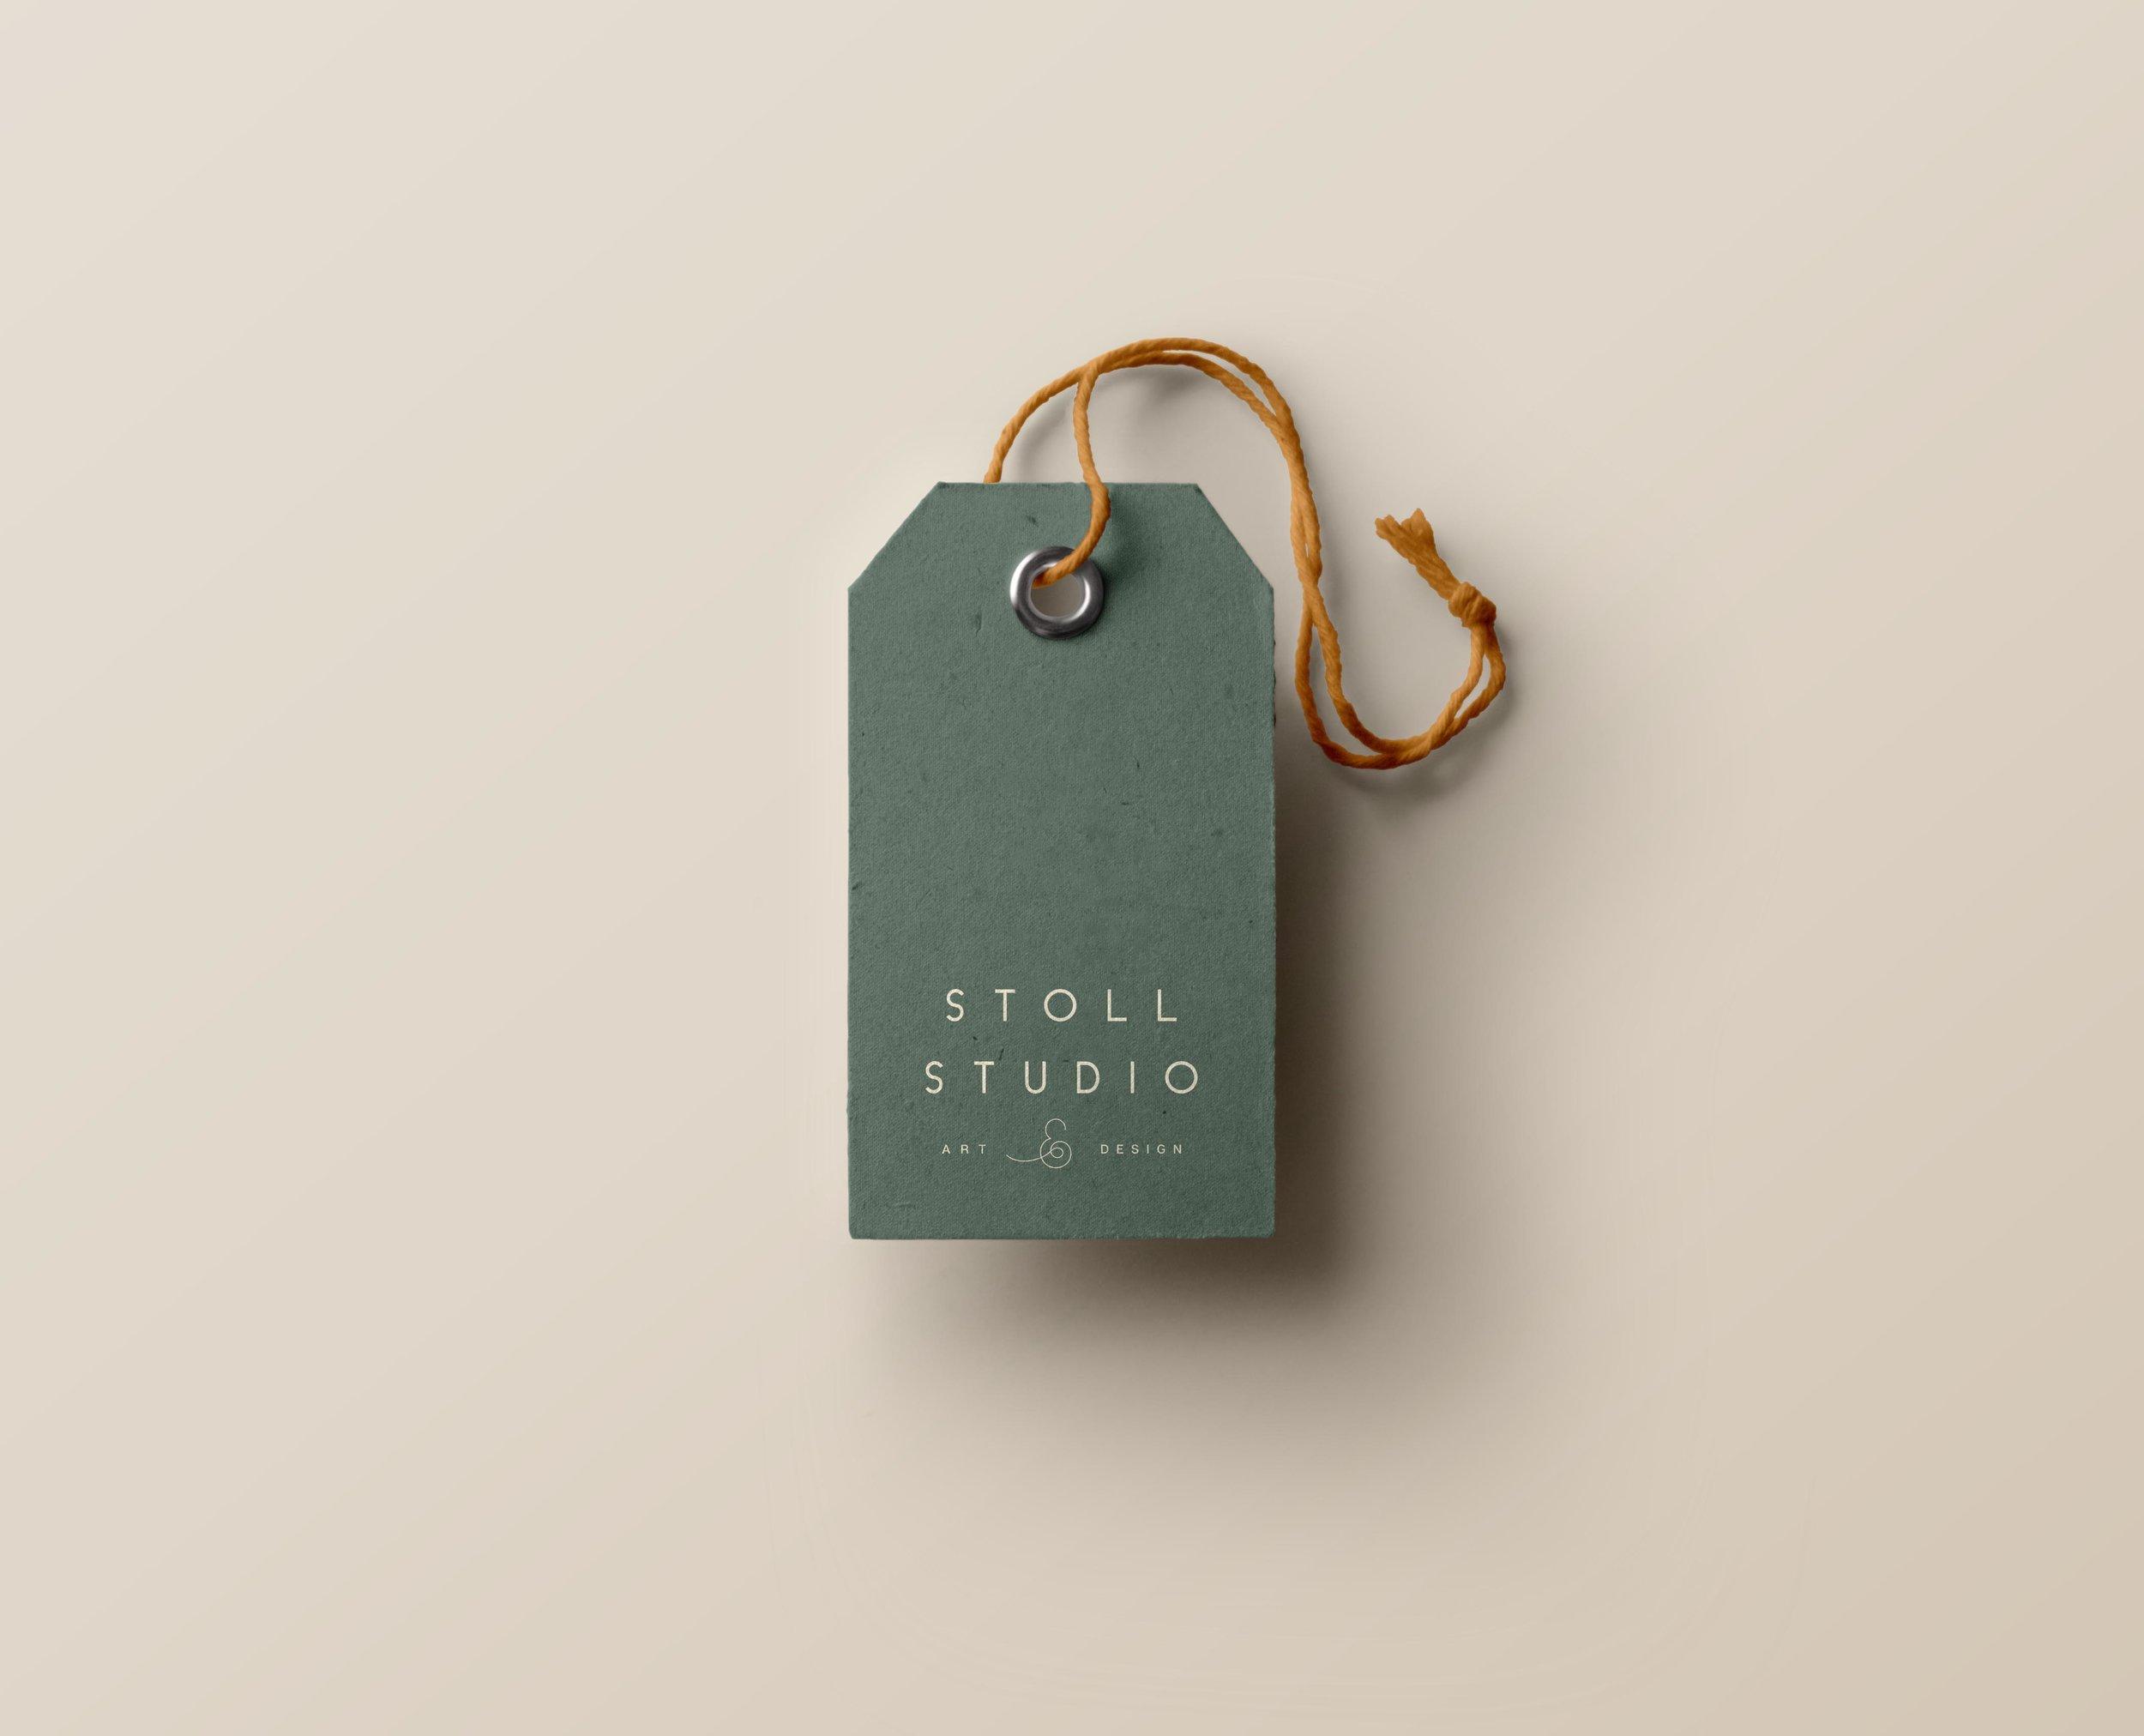 Stoll-Studio-Tag-by-Reverie-House-Studio.jpg